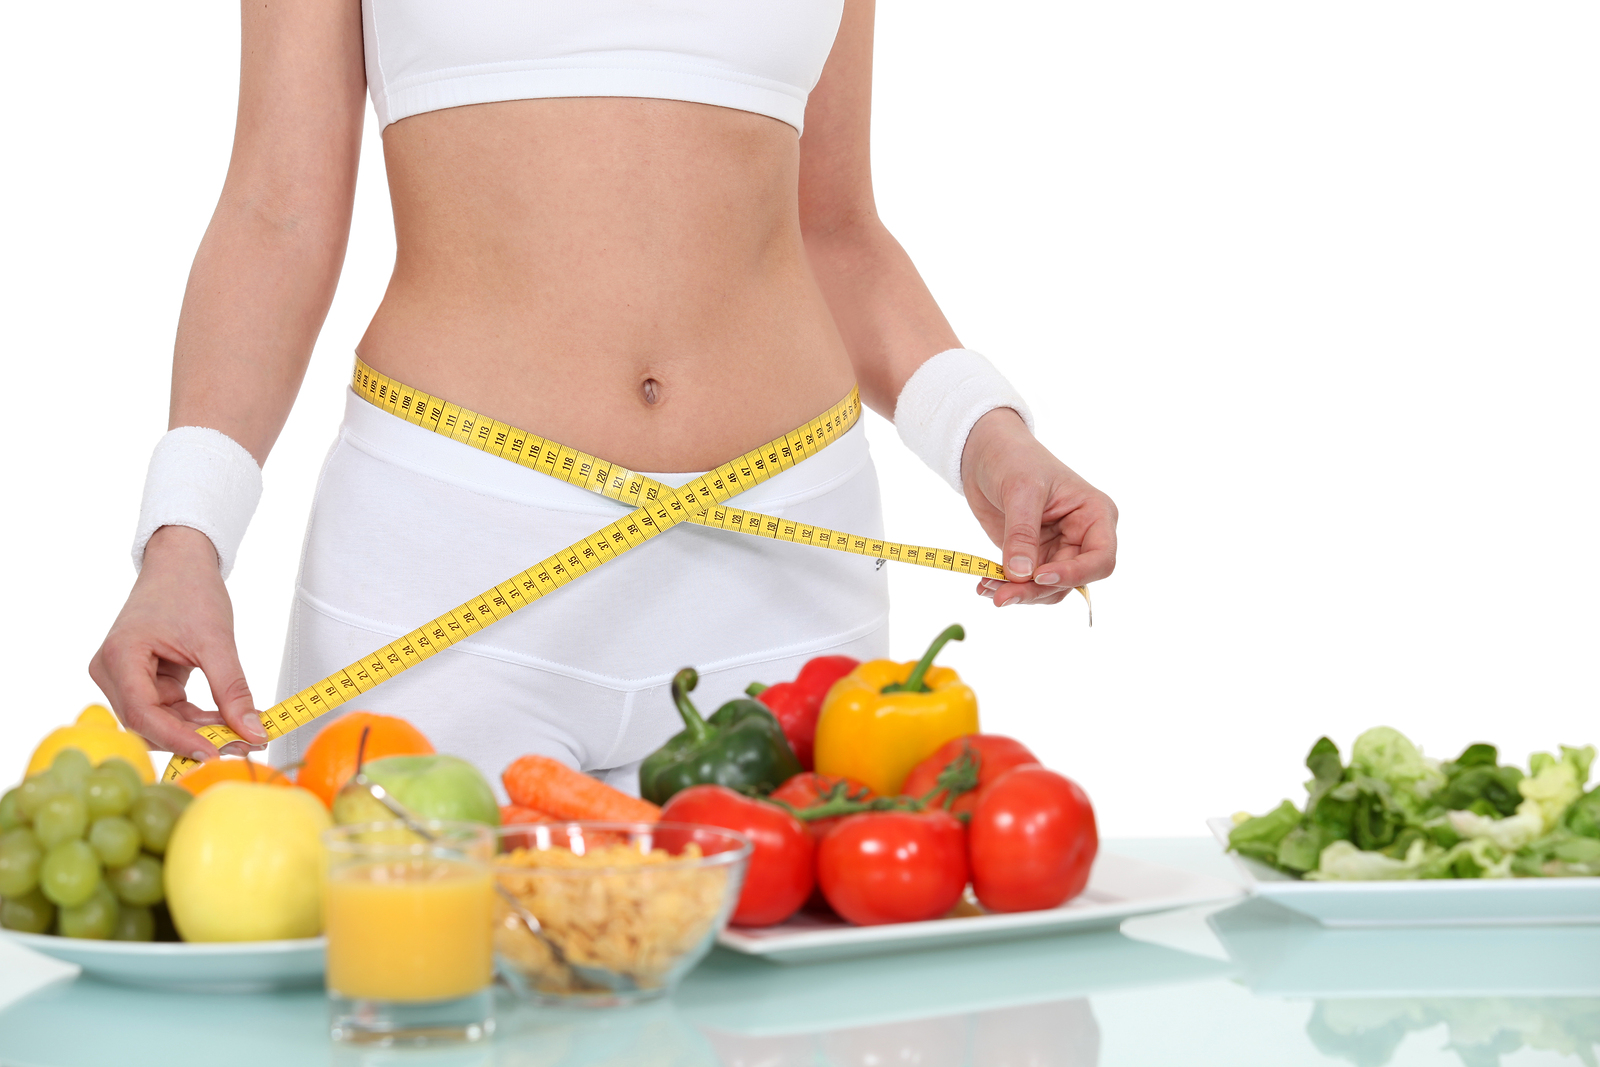 Conoce la nueva dieta atkins, la dieta de los famosos